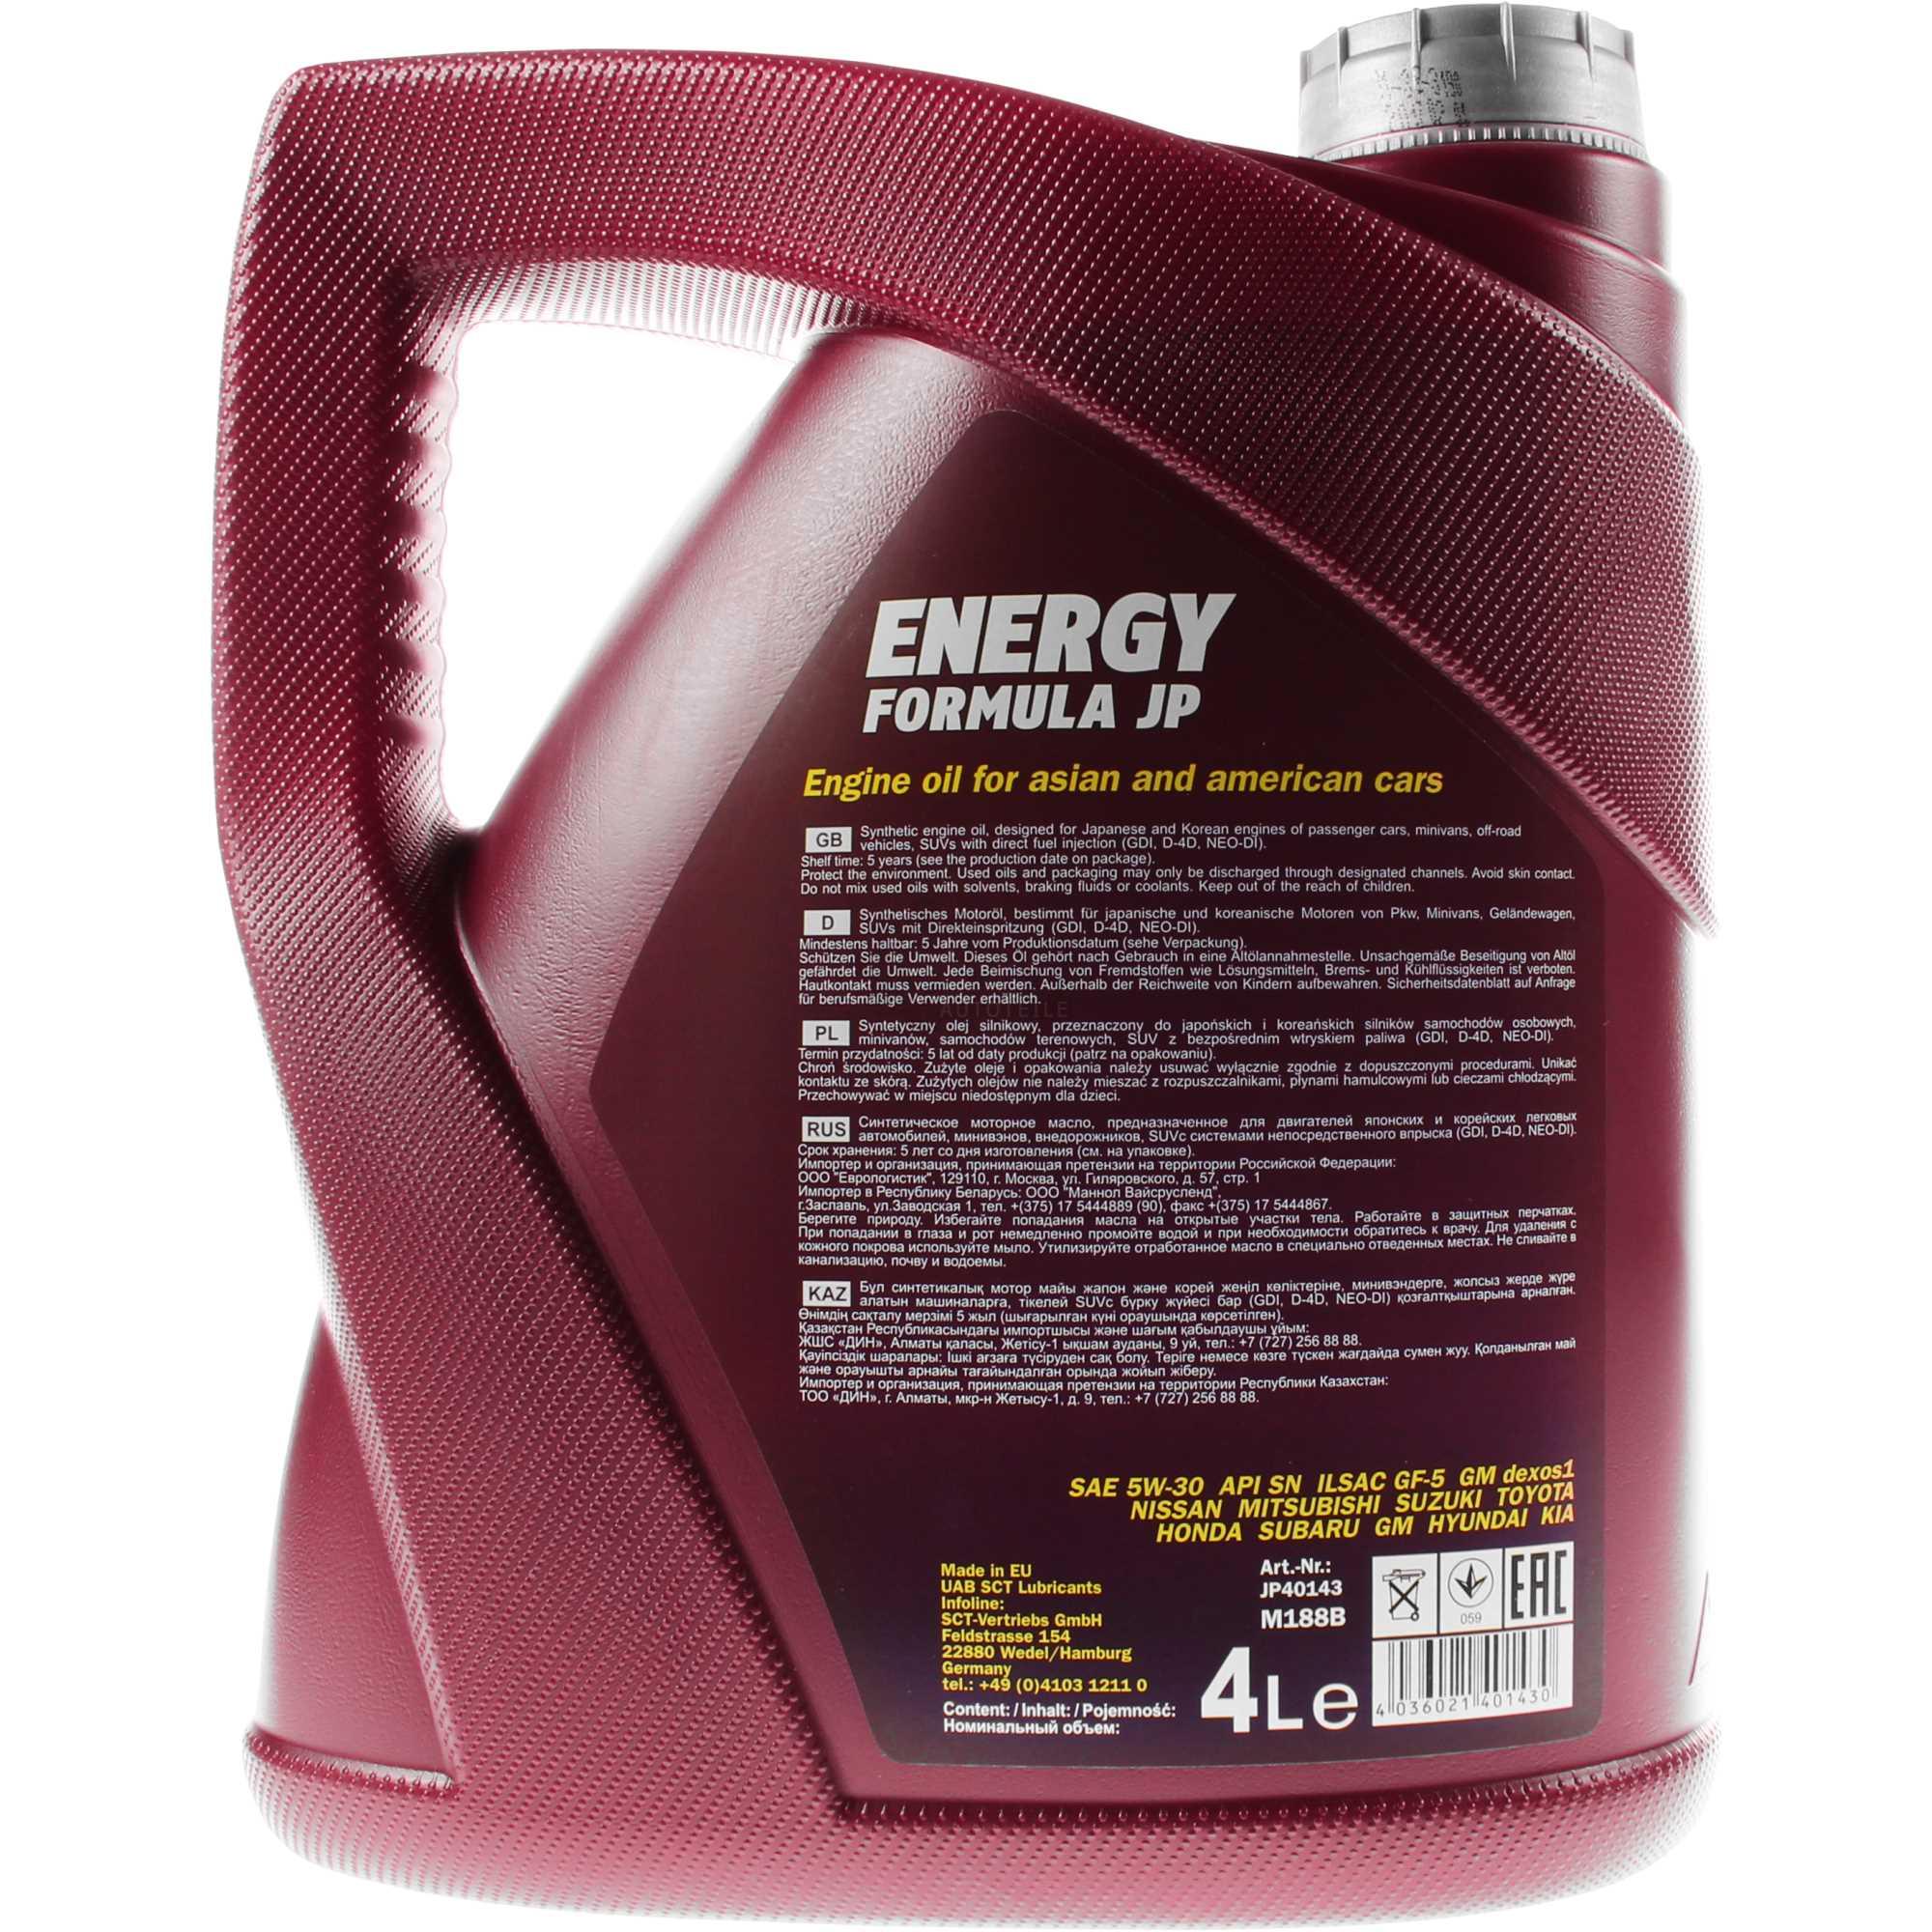 Aceite-del-motor-aceite-5w40-10w40-15w40-5w30-10w60-1l-4l-5l-7l-10l-20l miniatura 45